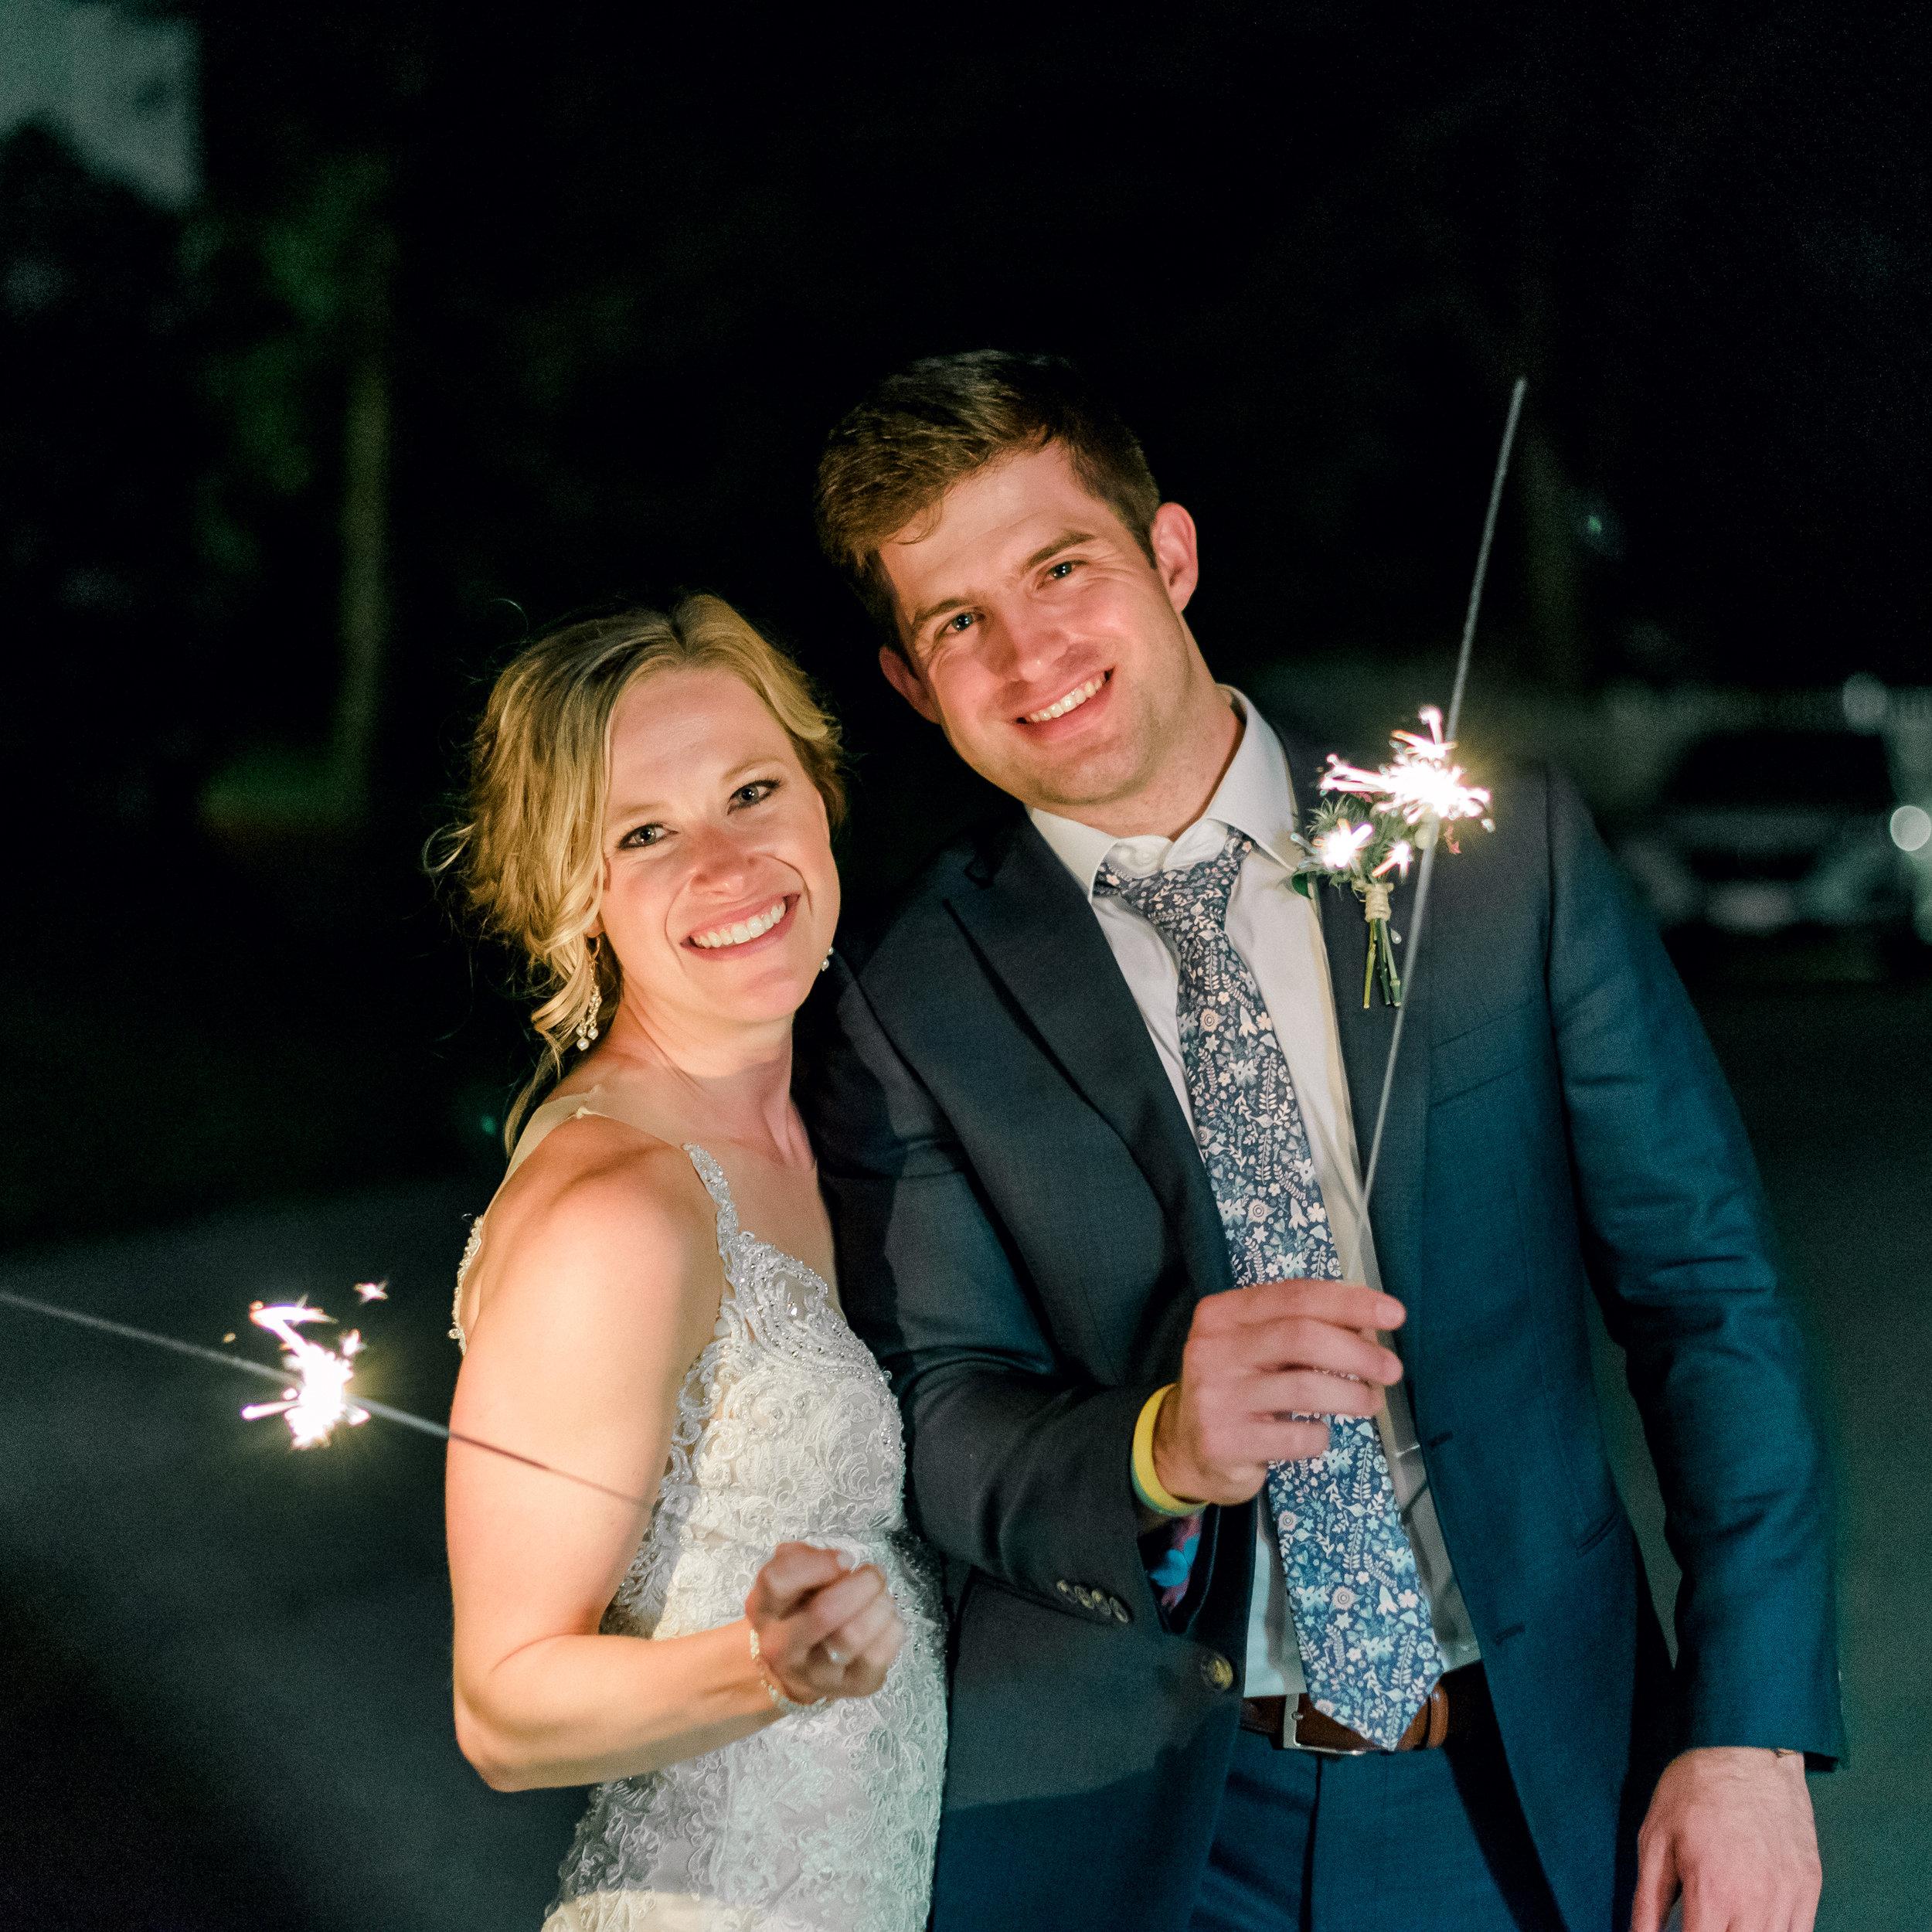 pittsburgh-wedding-photographer-shady-elms-farm-0063.jpg